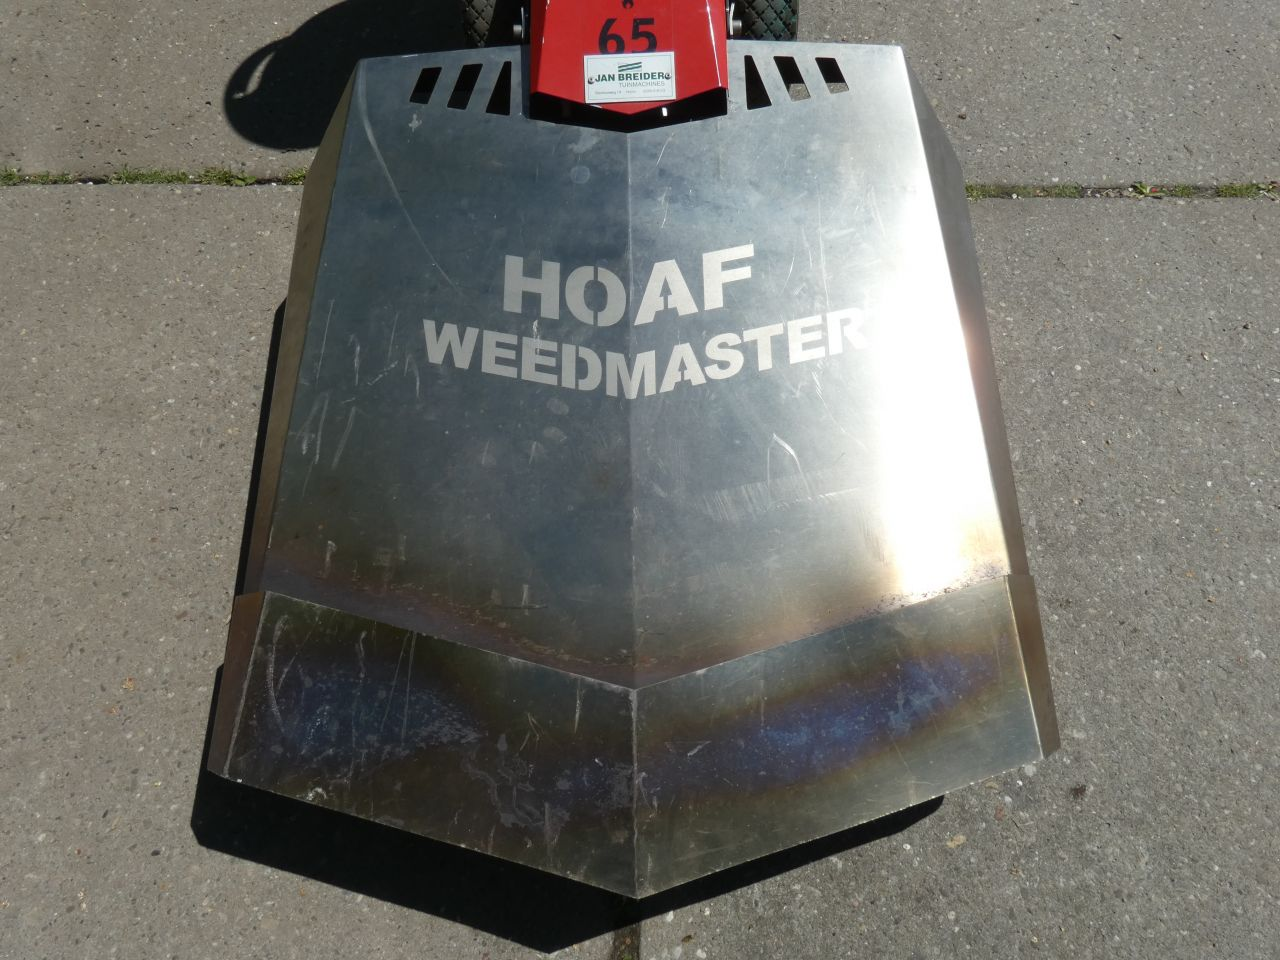 HOAF onkruidbrander (type Weedmaster 65, i.z.g.s.)